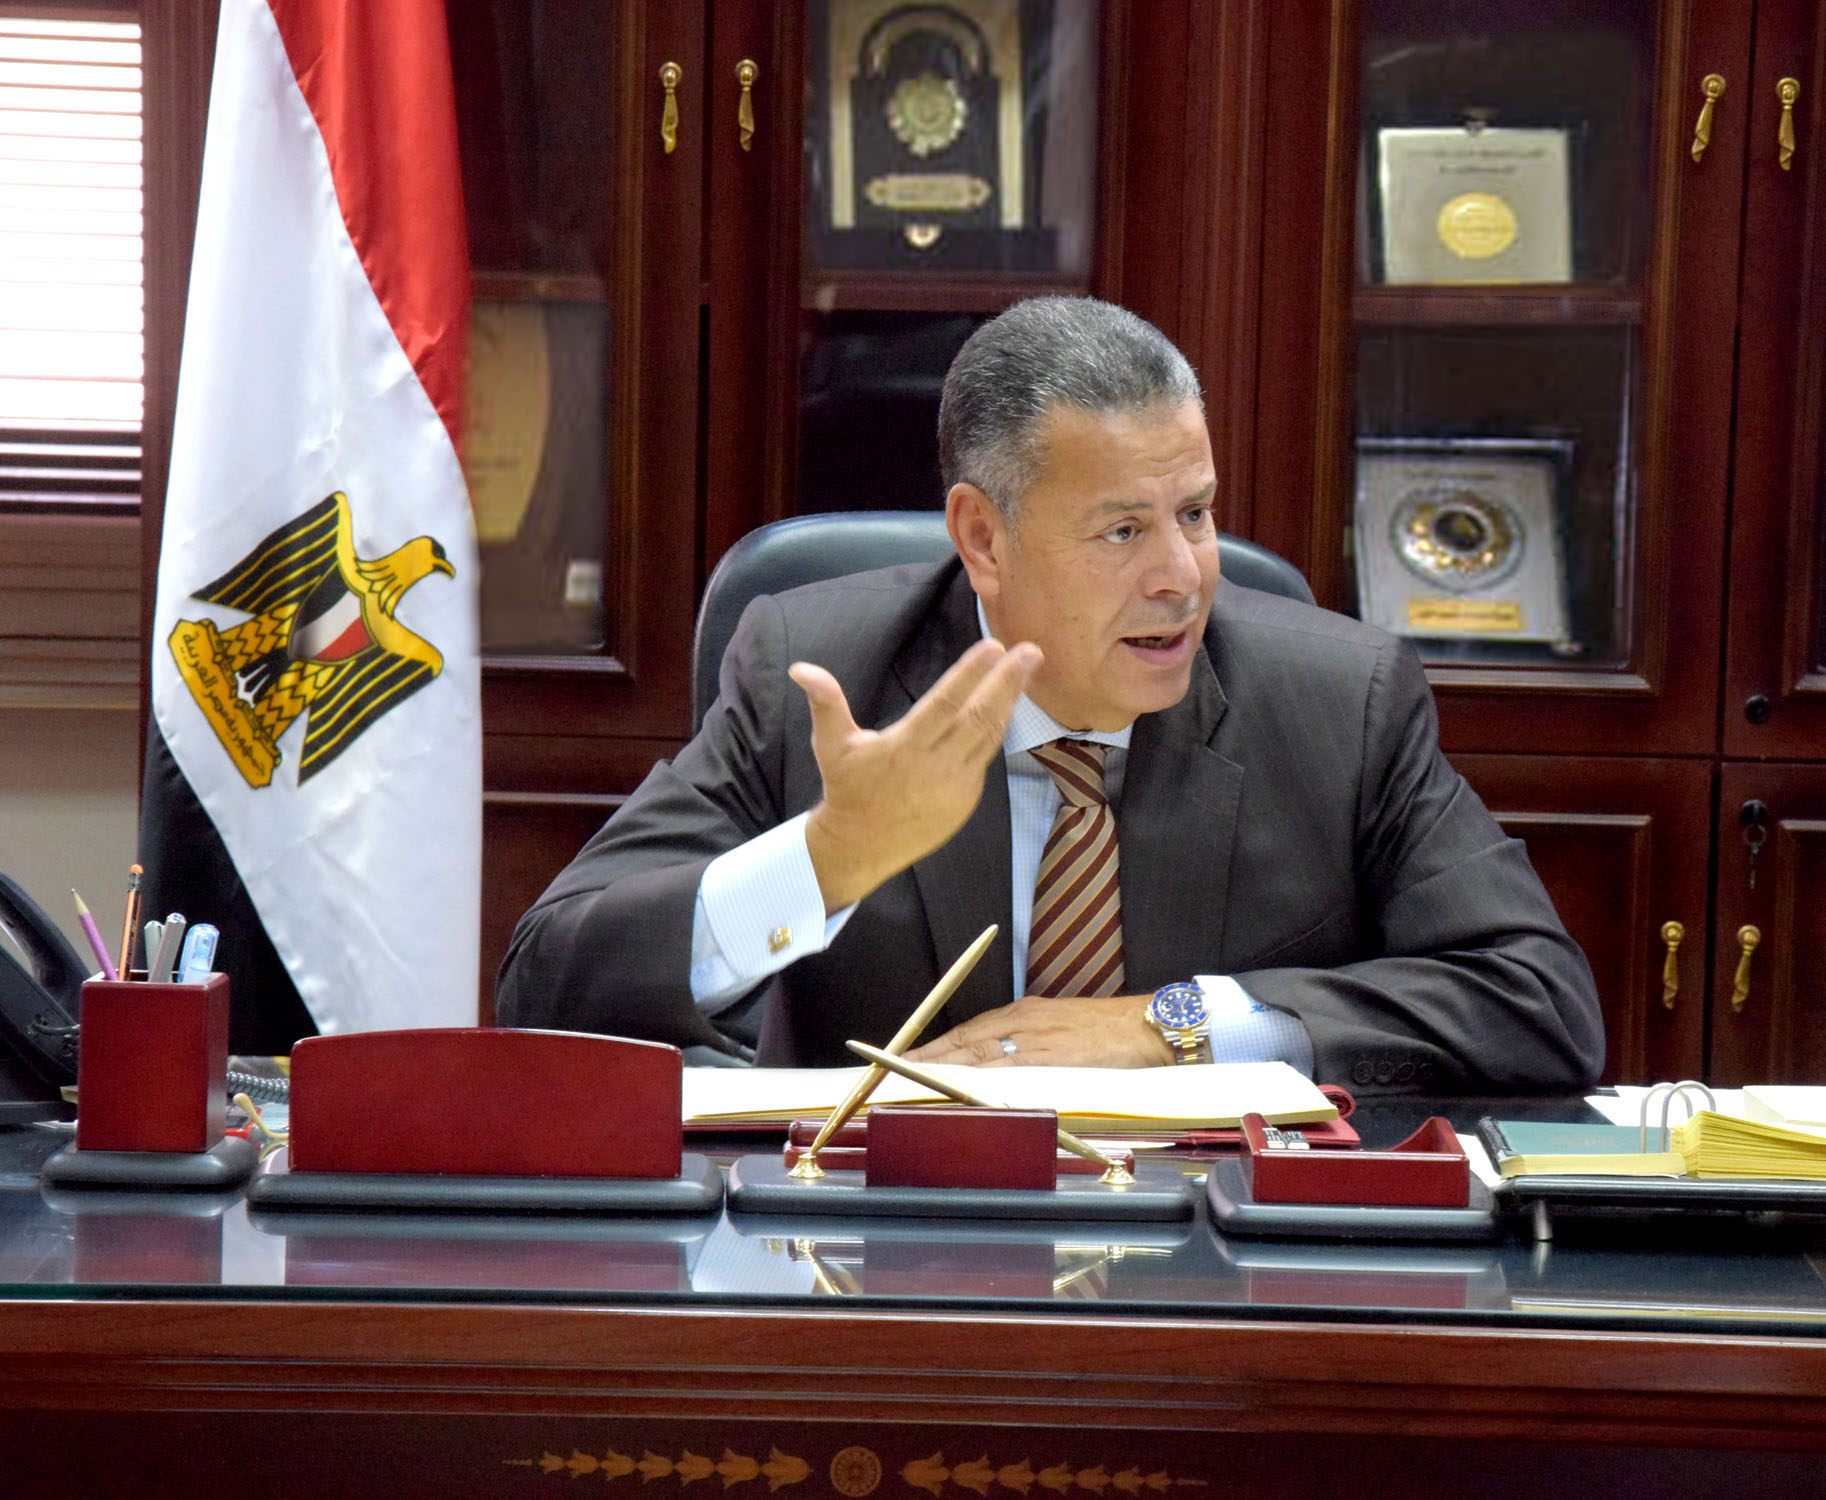 هاني عبد الجابر محافظ بني سويف